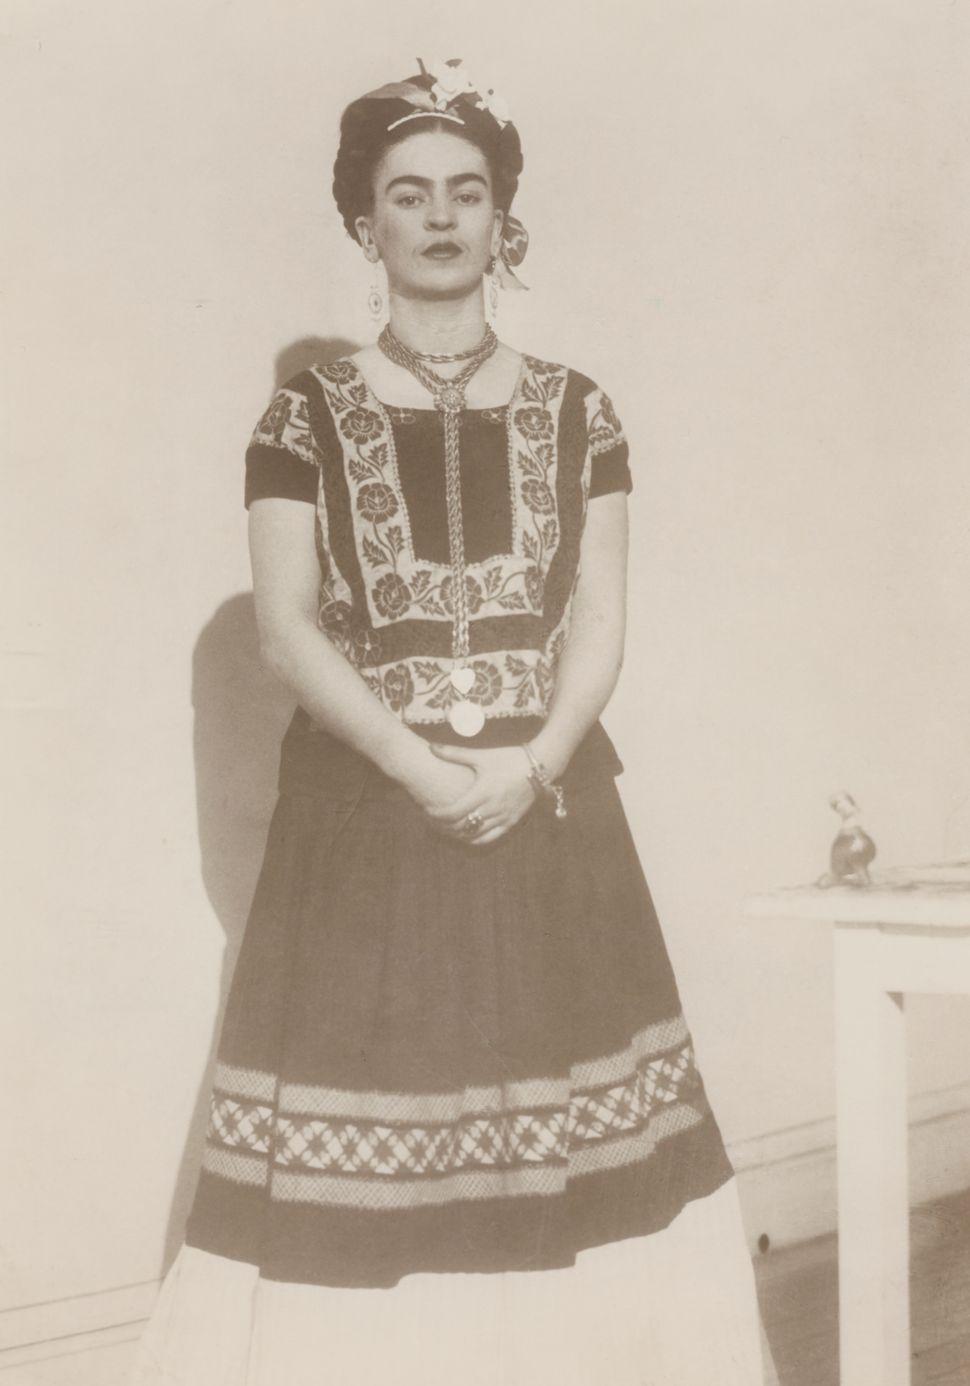 Dora Maar image of Frida Kahlo at Andre Breton, Paris, 1938-9 gelatin silver print 11